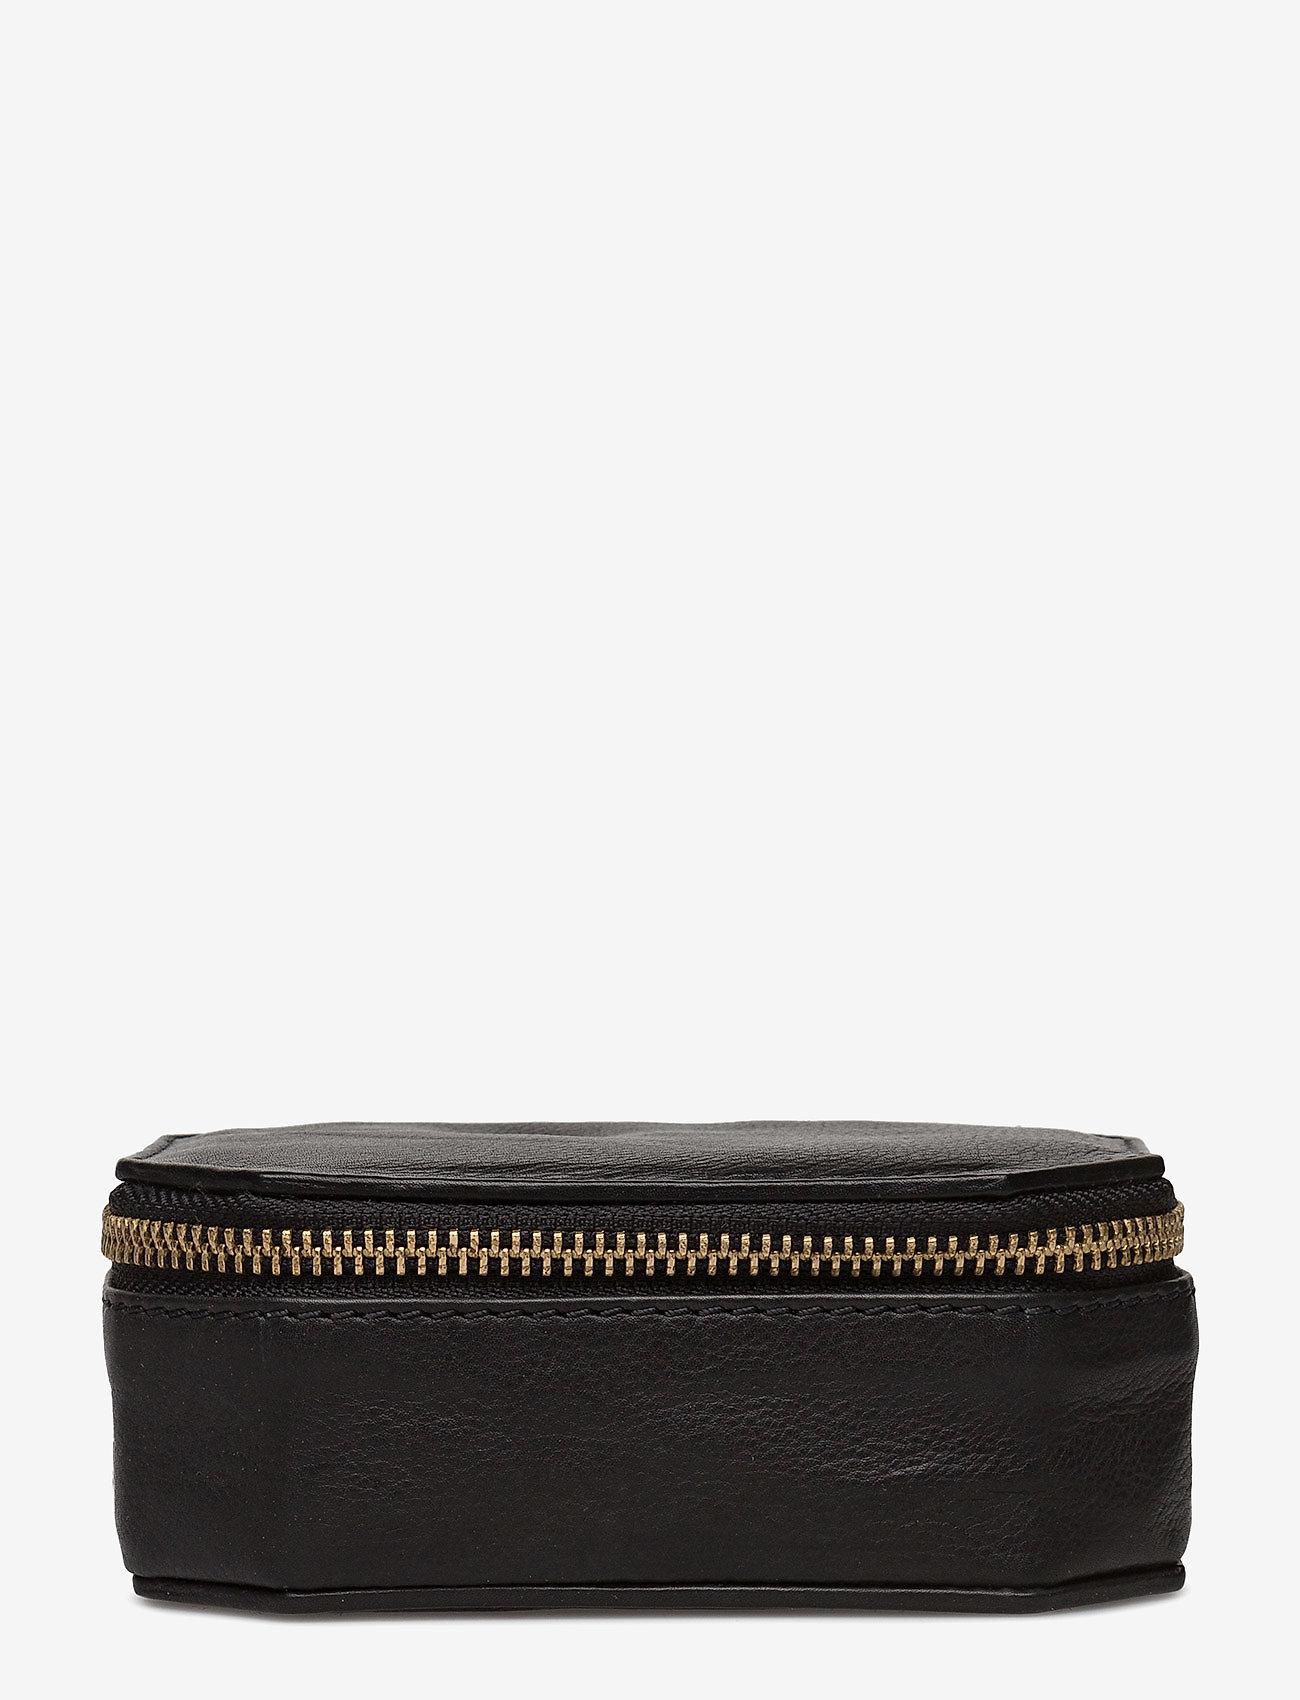 DEPECHE - Jewellery box large - smykkeskrin - black - 0